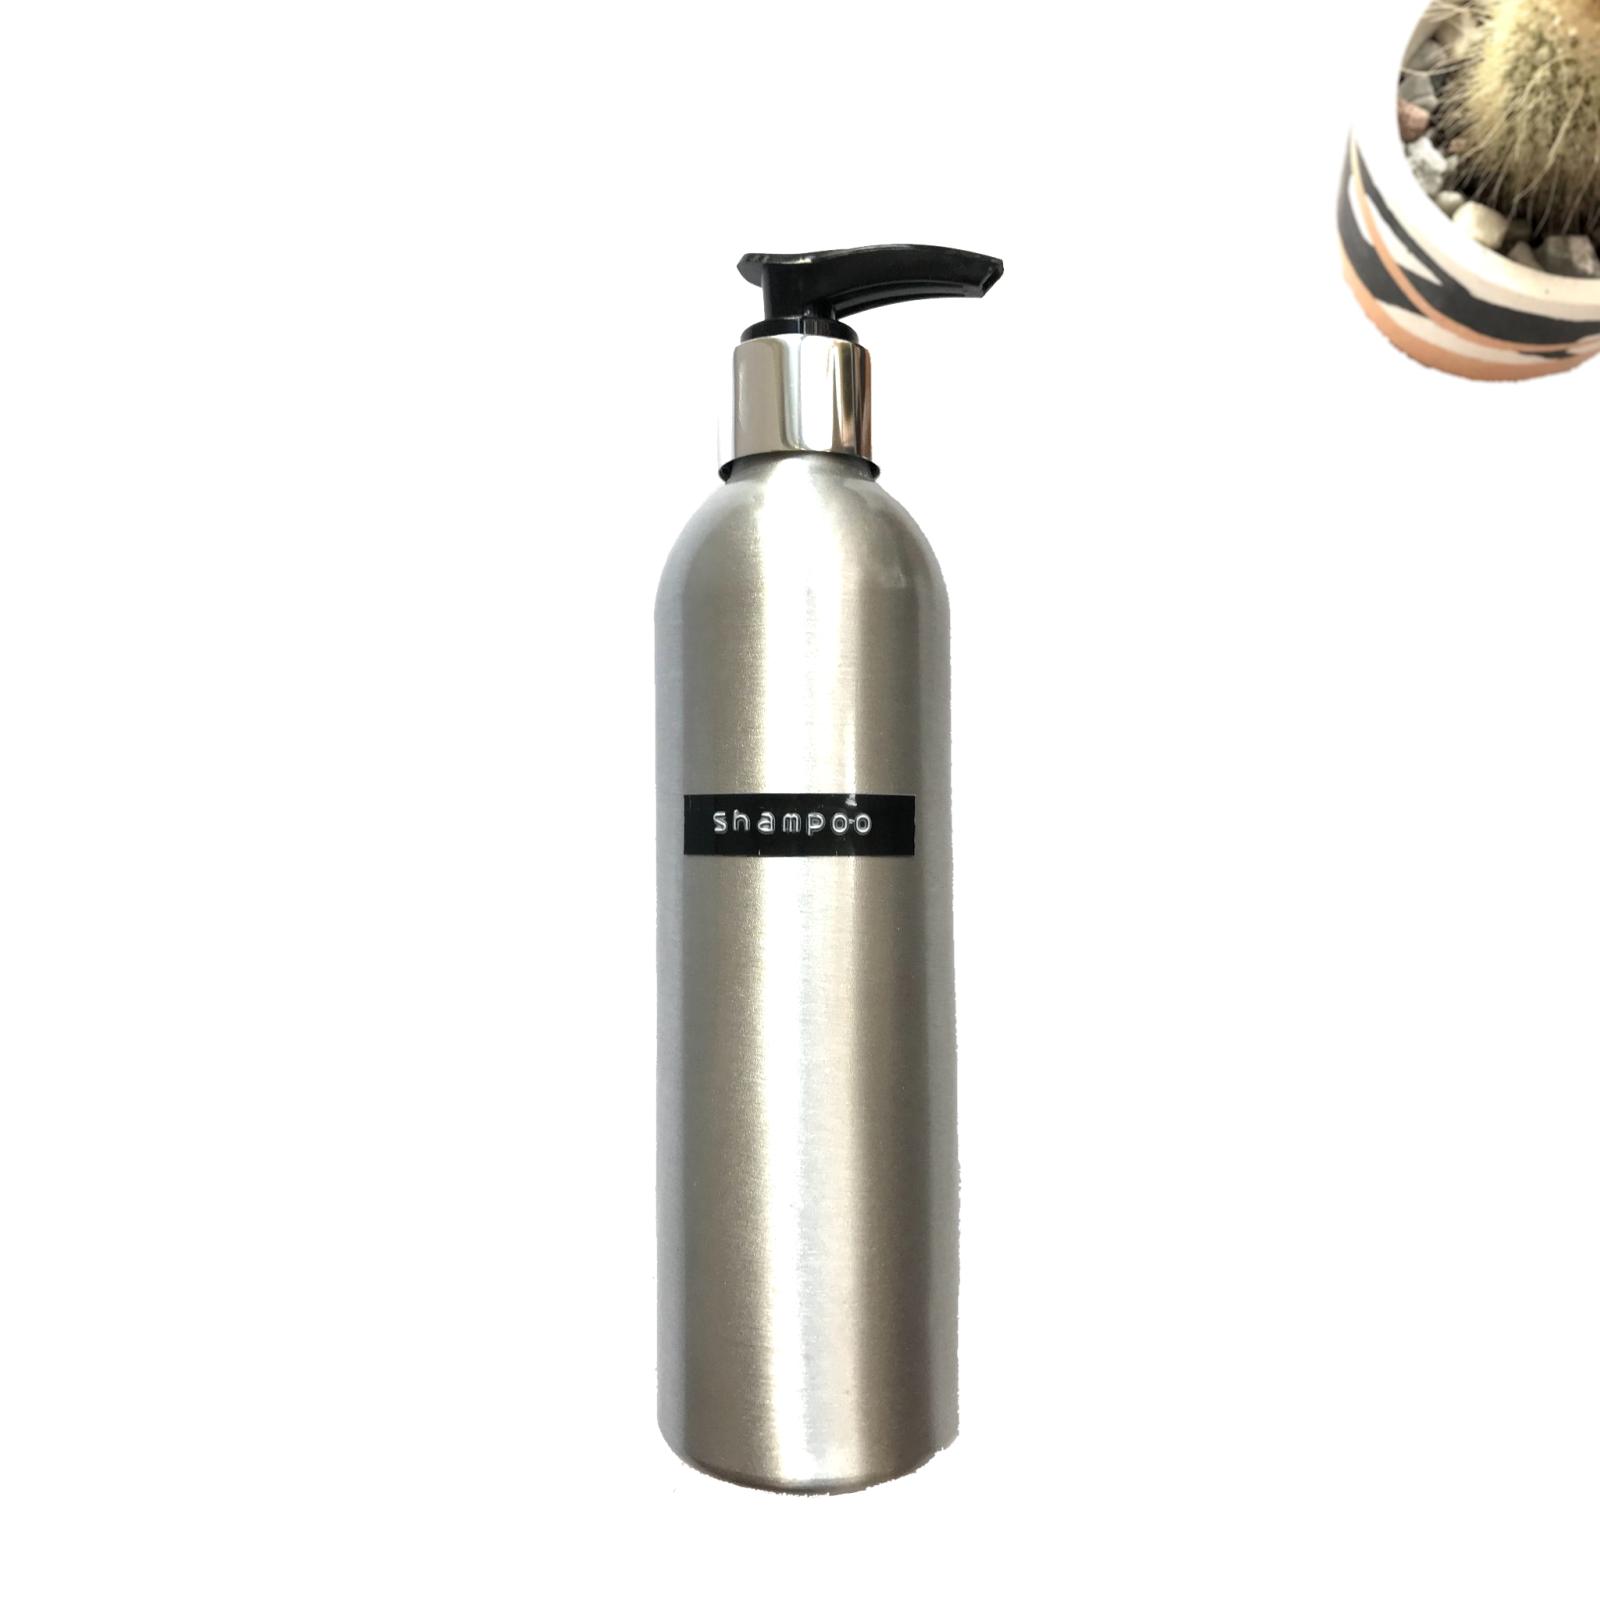 Product image for suma shampoo refill